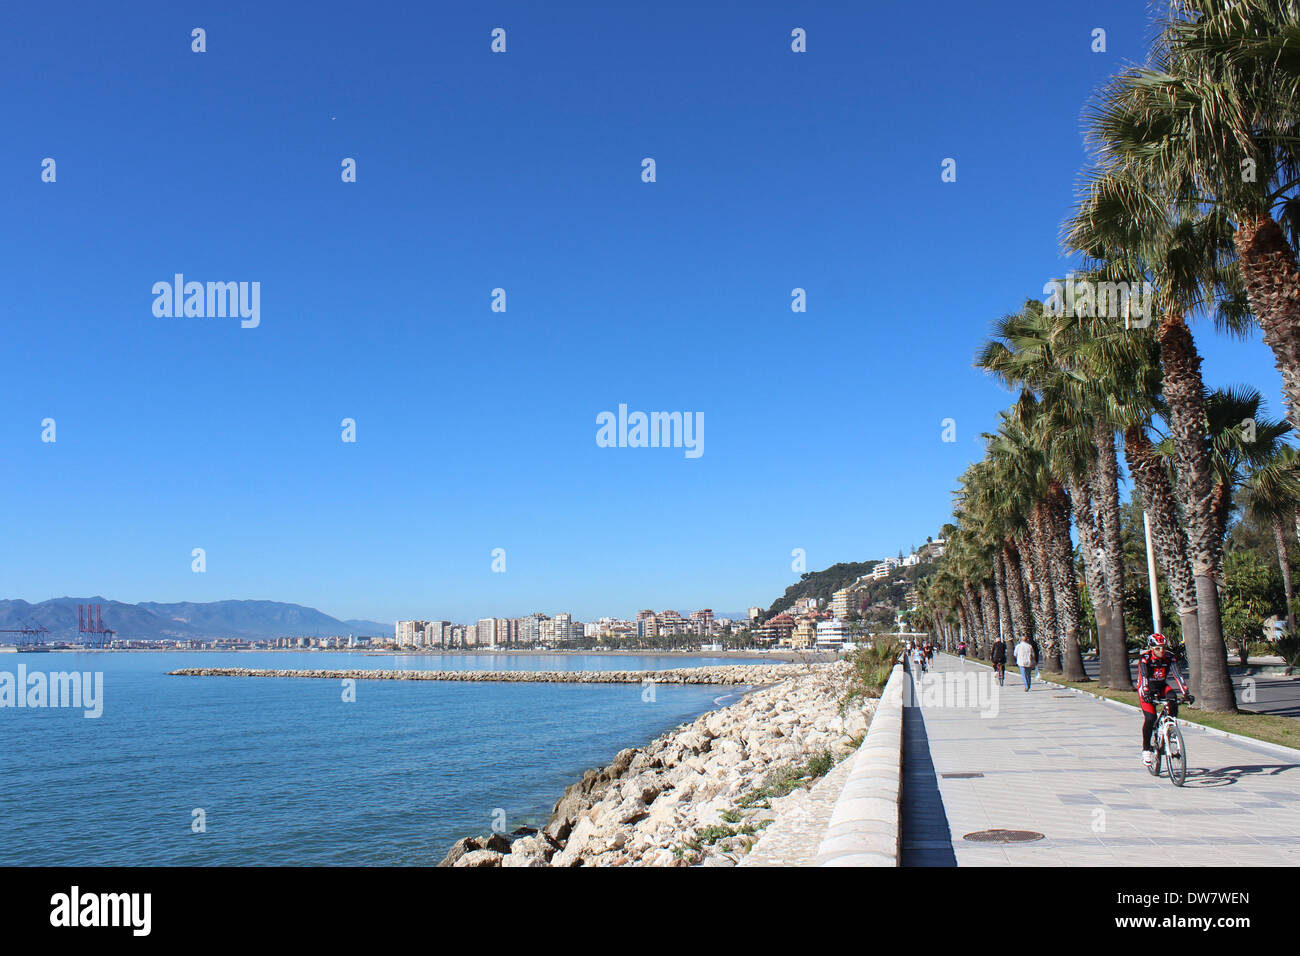 Banos Del Carmen 2 Kilometres East Of Central Malaga Home To A